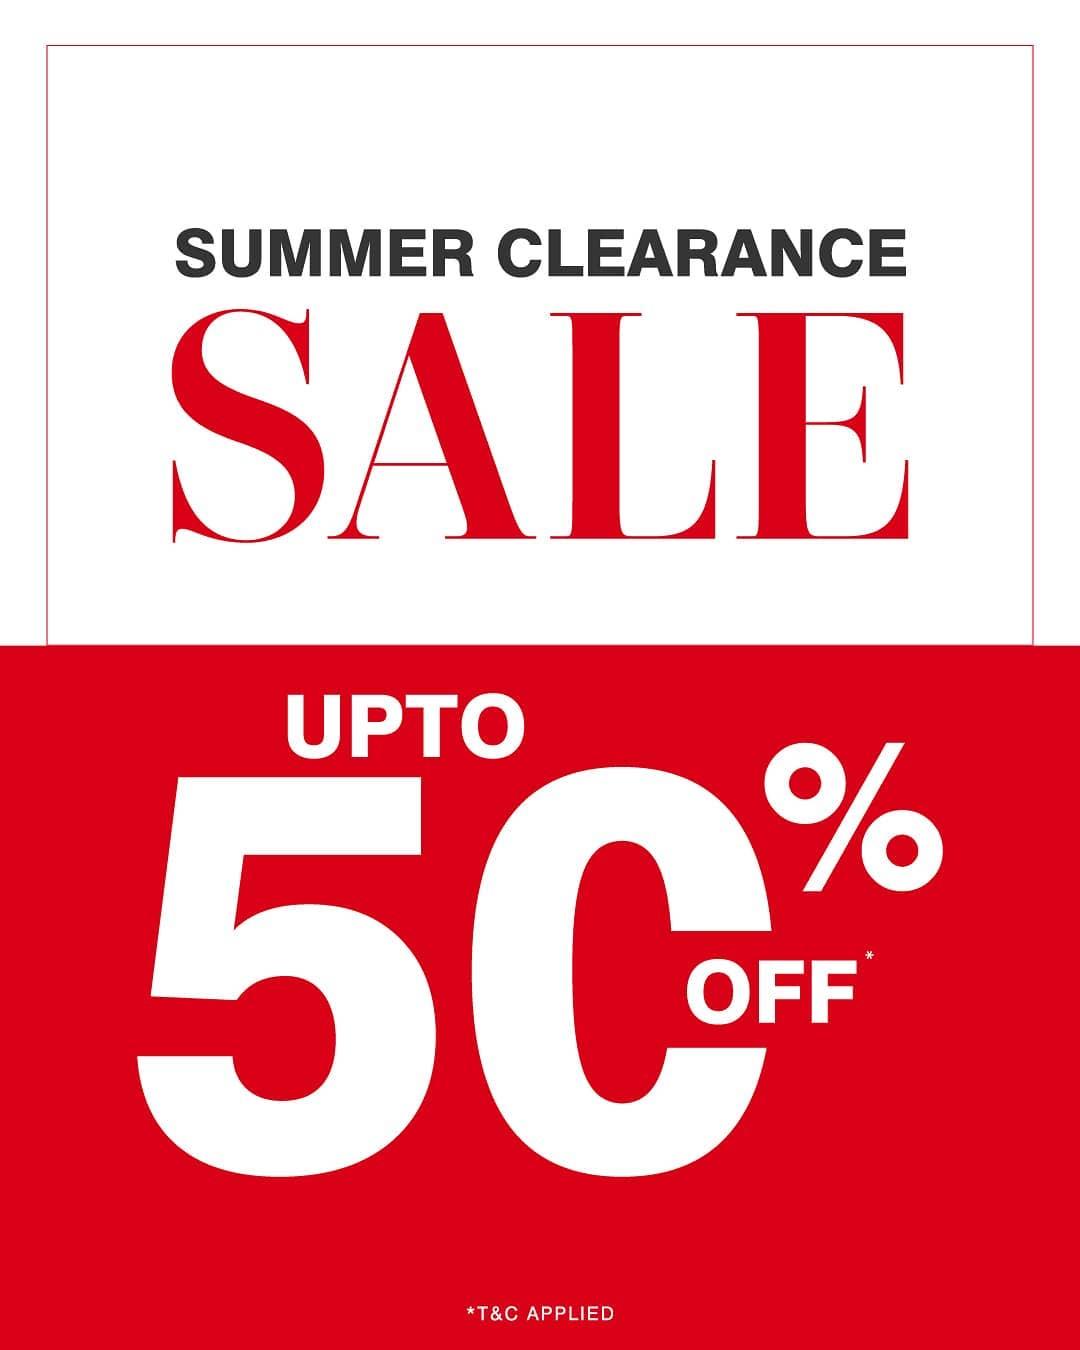 The Cambridge Shop - Summer Clearance Sale